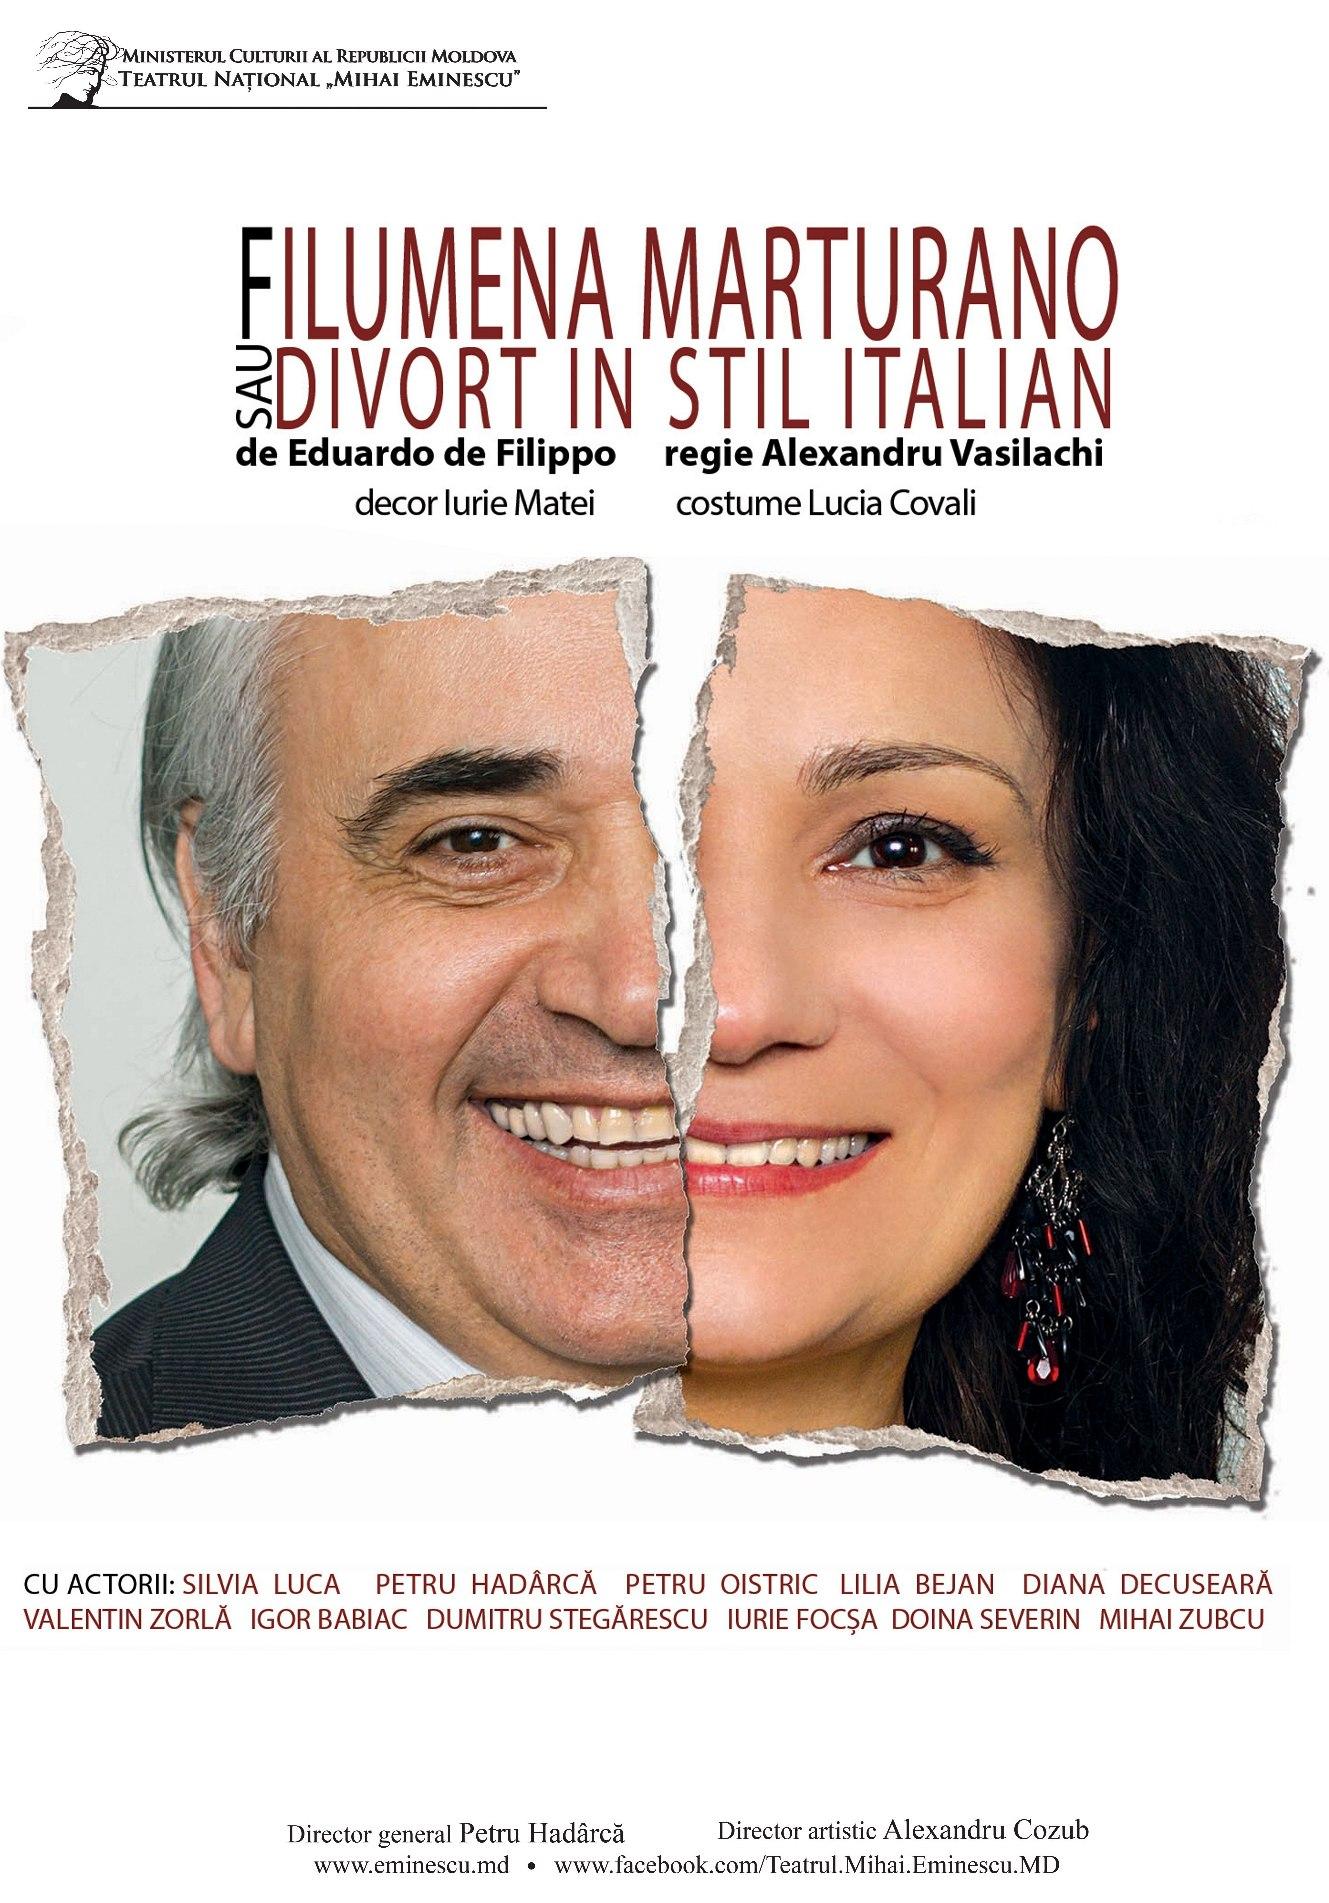 Filumena_Marturano_sau_divort_in_stil_italian (1Afis. )